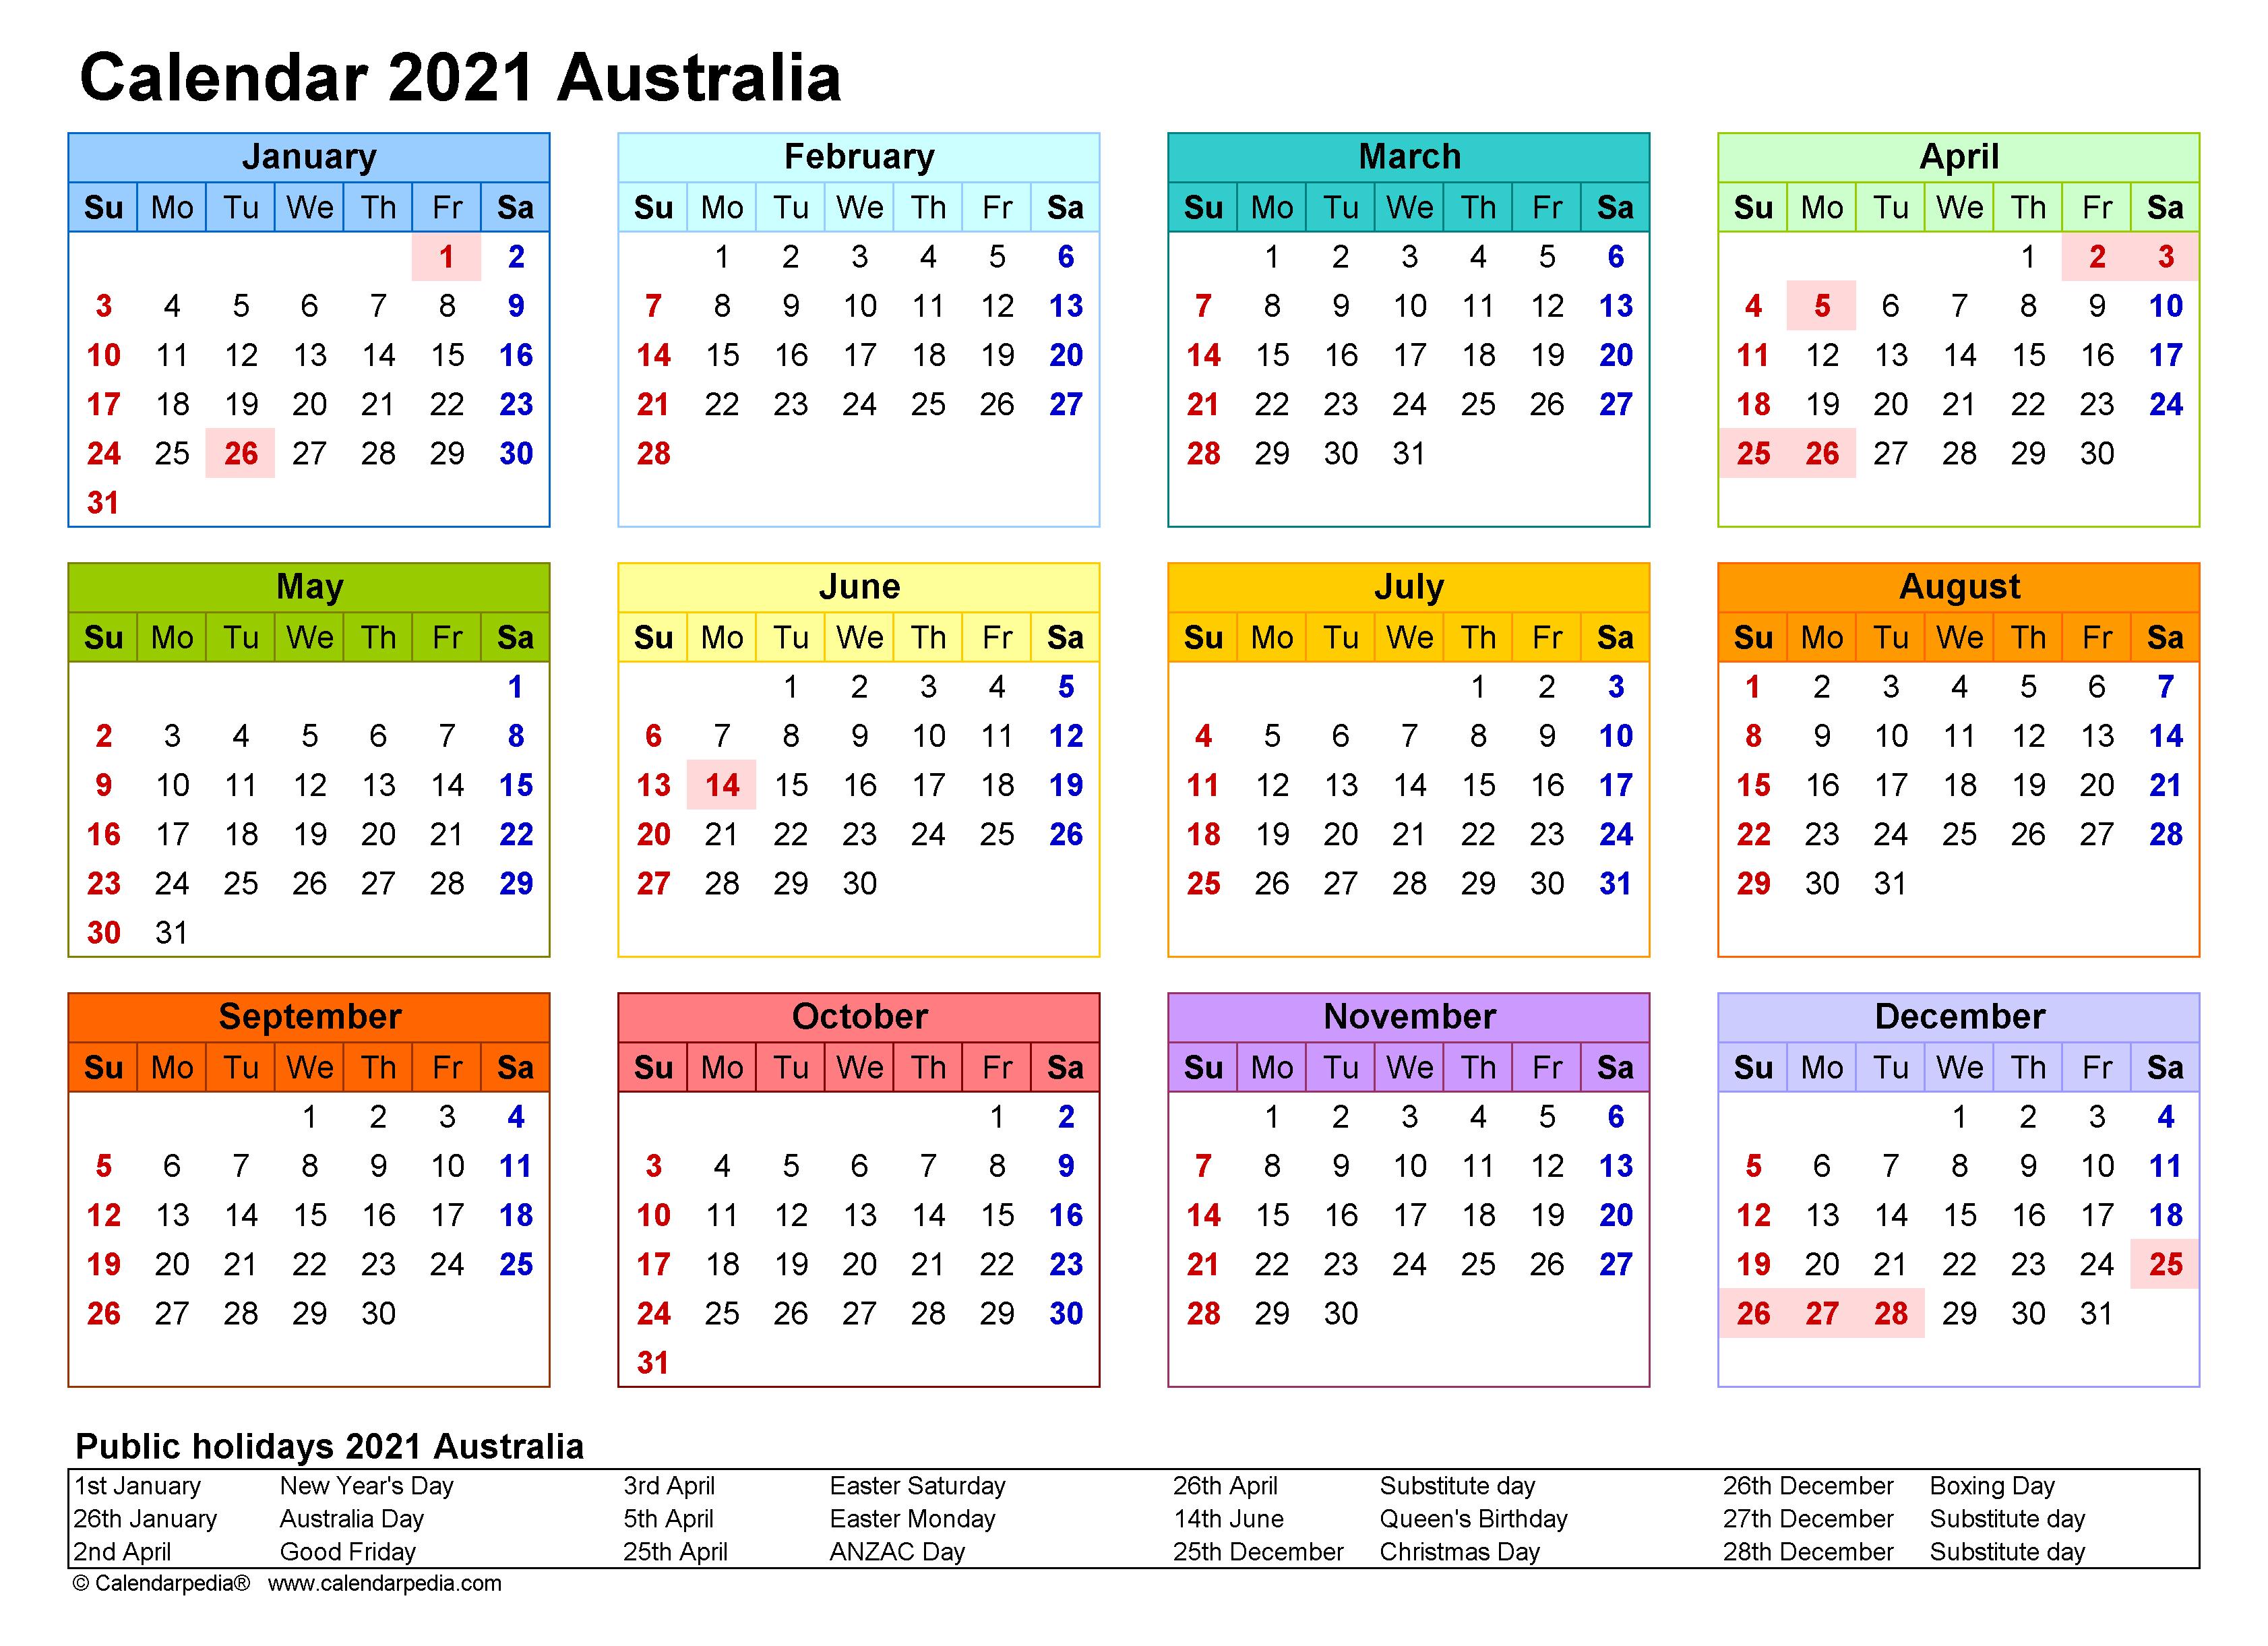 Free Printable 2021 Australia Holidays Calendar Template